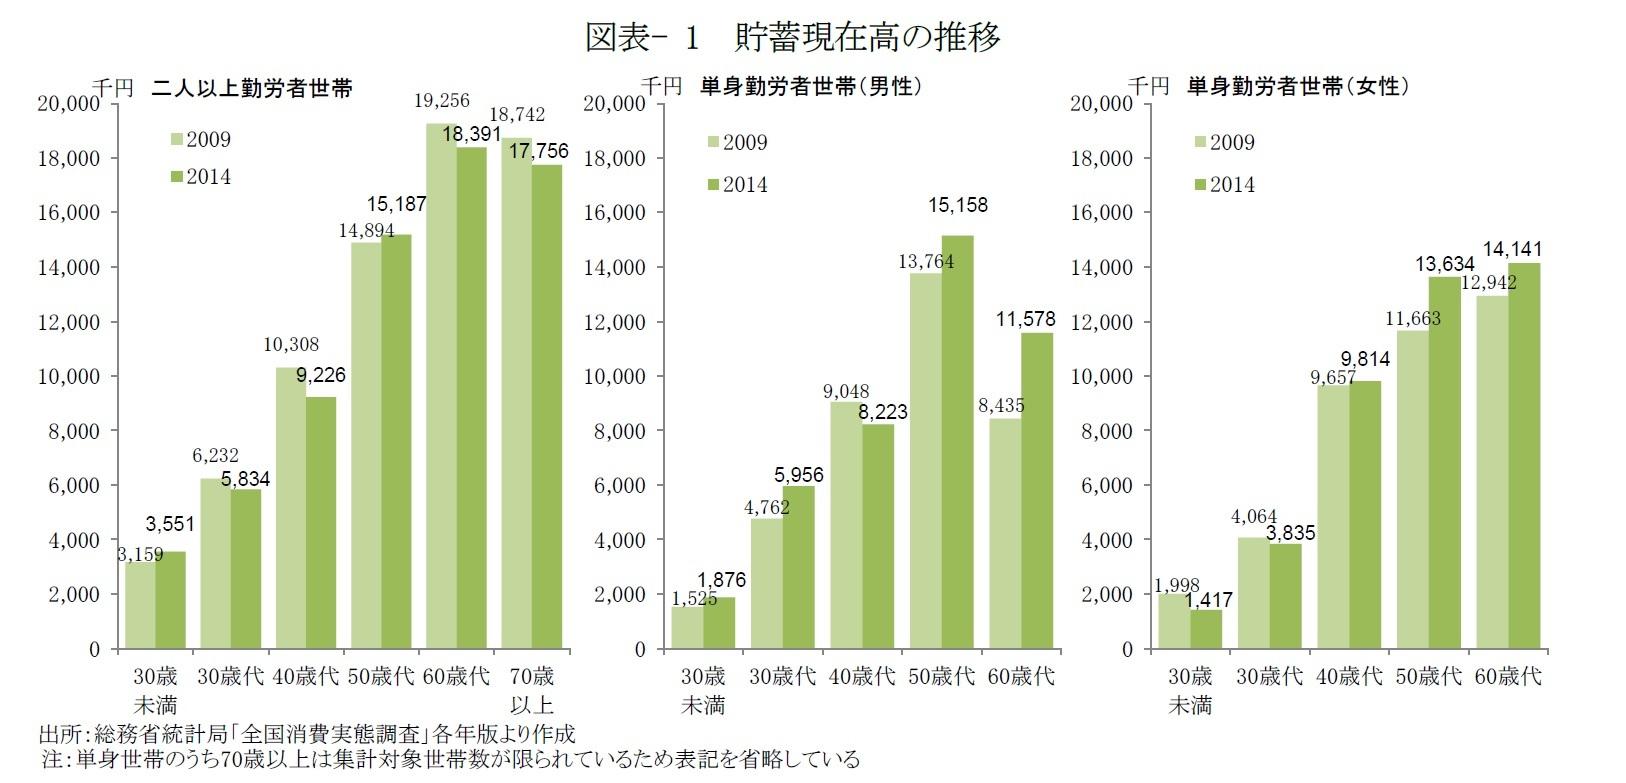 図表- 1 貯蓄現在高の推移